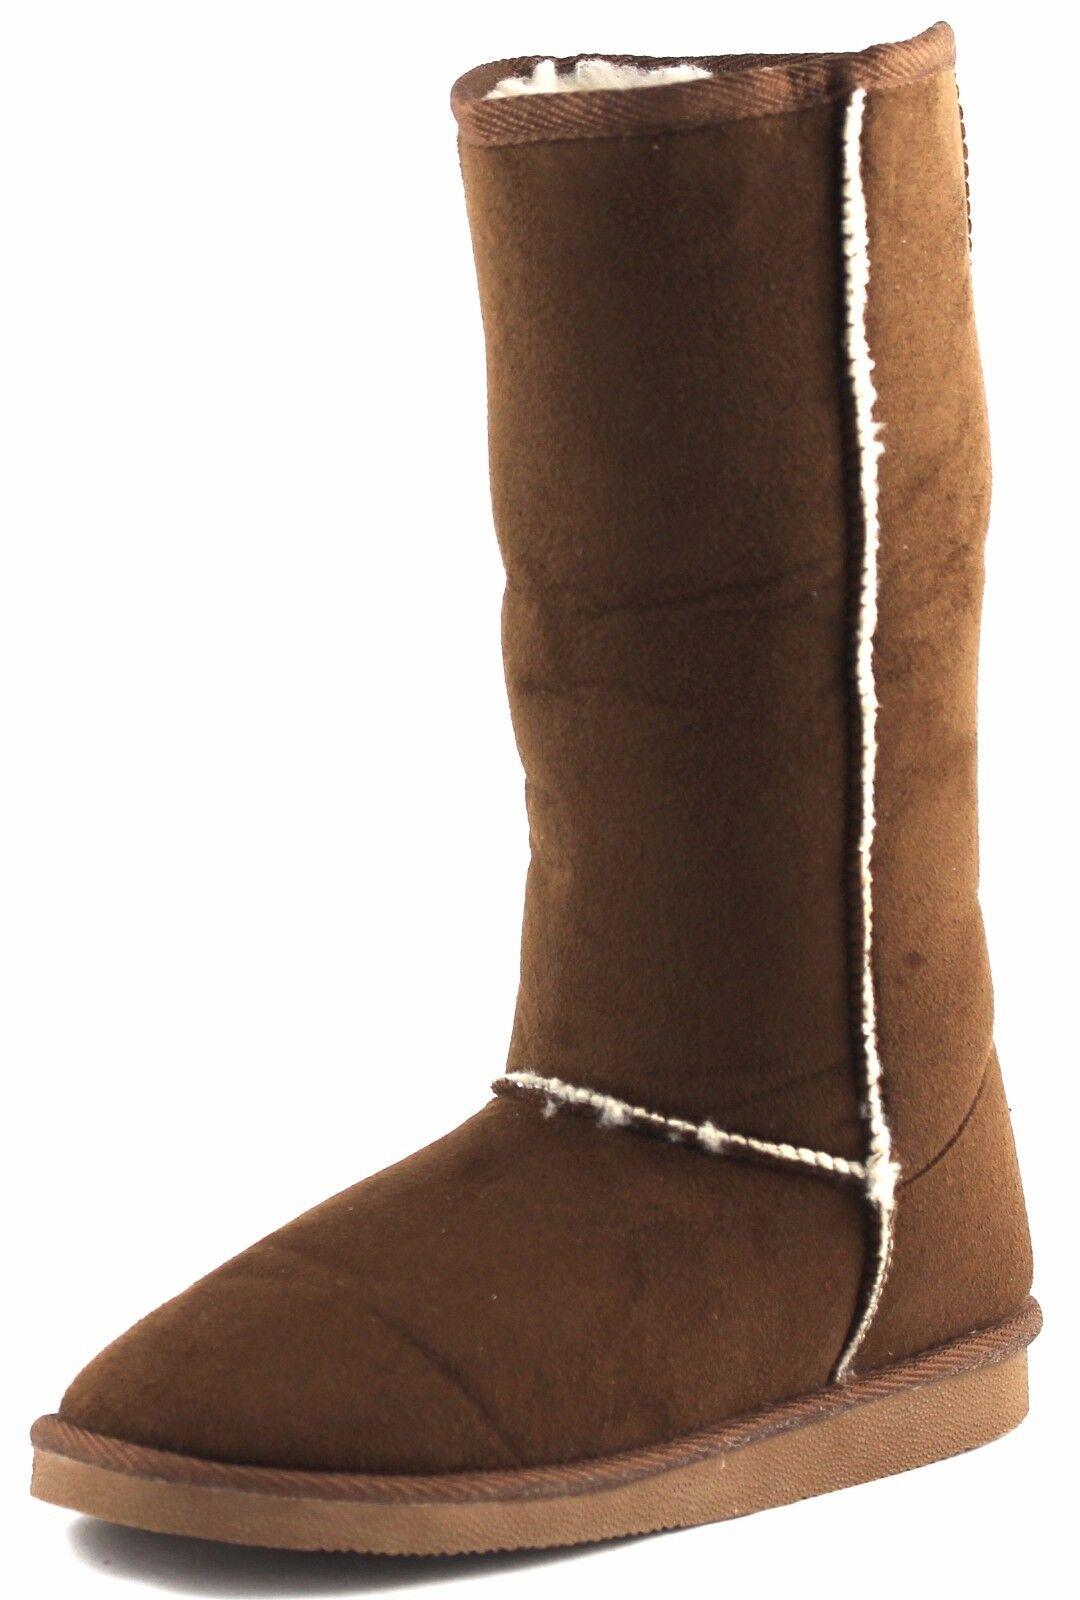 Damen Winterstiefel by Idana Boots Warmfutter NEU Gr. 36-42 Nur 14,95 € NEU 117